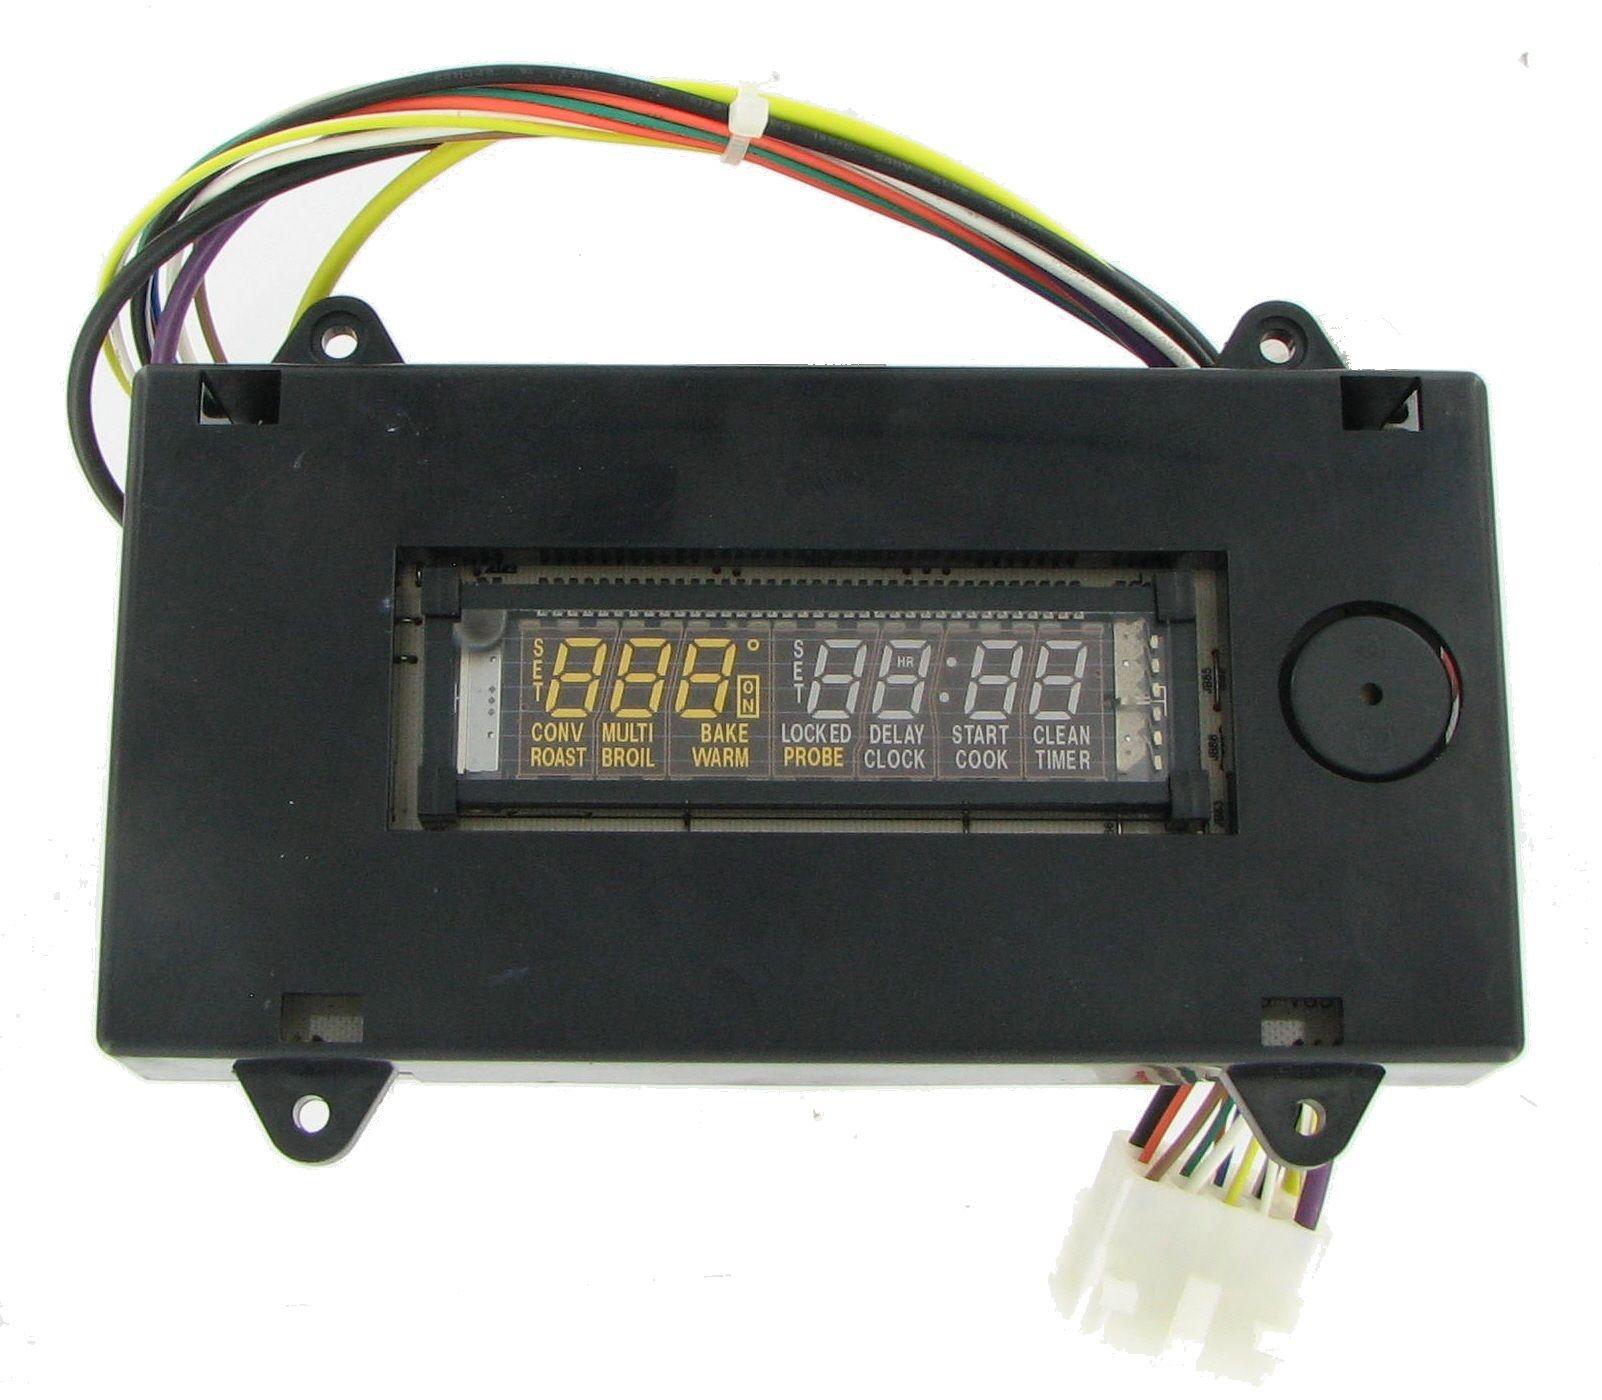 GE WB27T10592 Oven Control Board   Repair Service